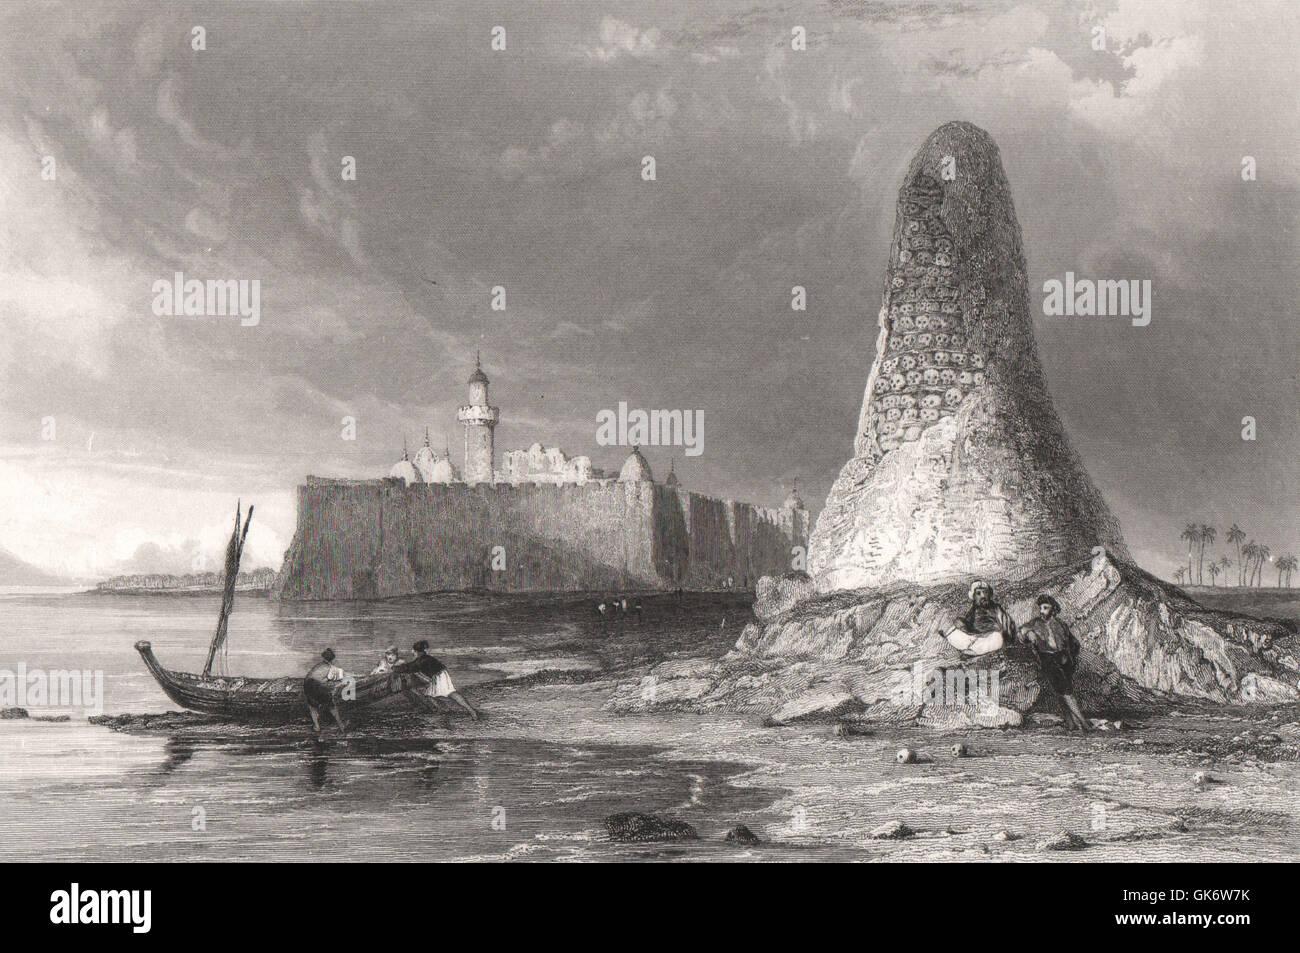 Burj-Er-Roos-or the Tower of Skulls, Djerba, Tunisia, antique print 1840 Stock Photo